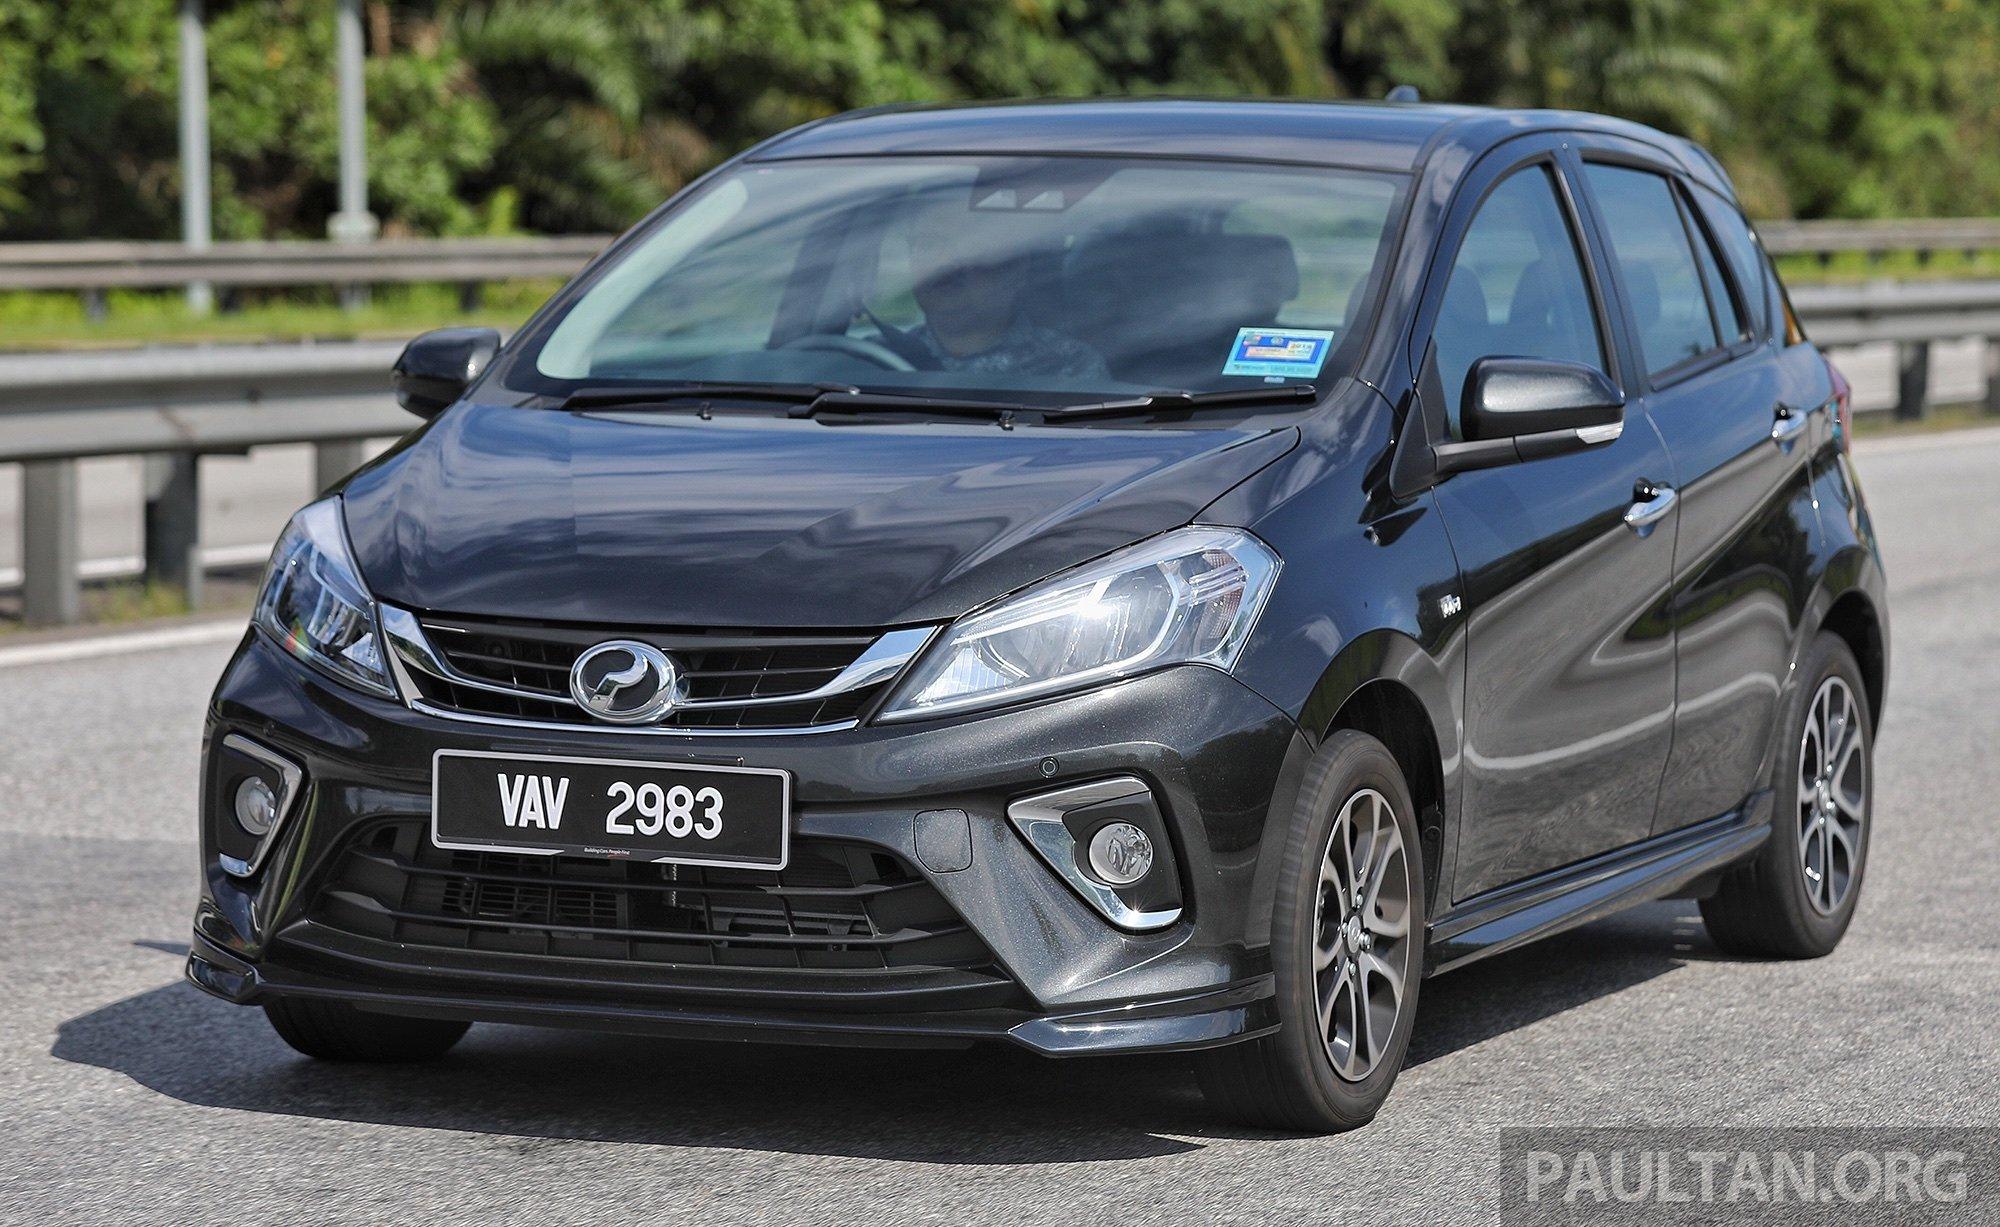 2018 Myvi Review >> DRIVEN: New 2018 Perodua Myvi – first impressions Image 740494